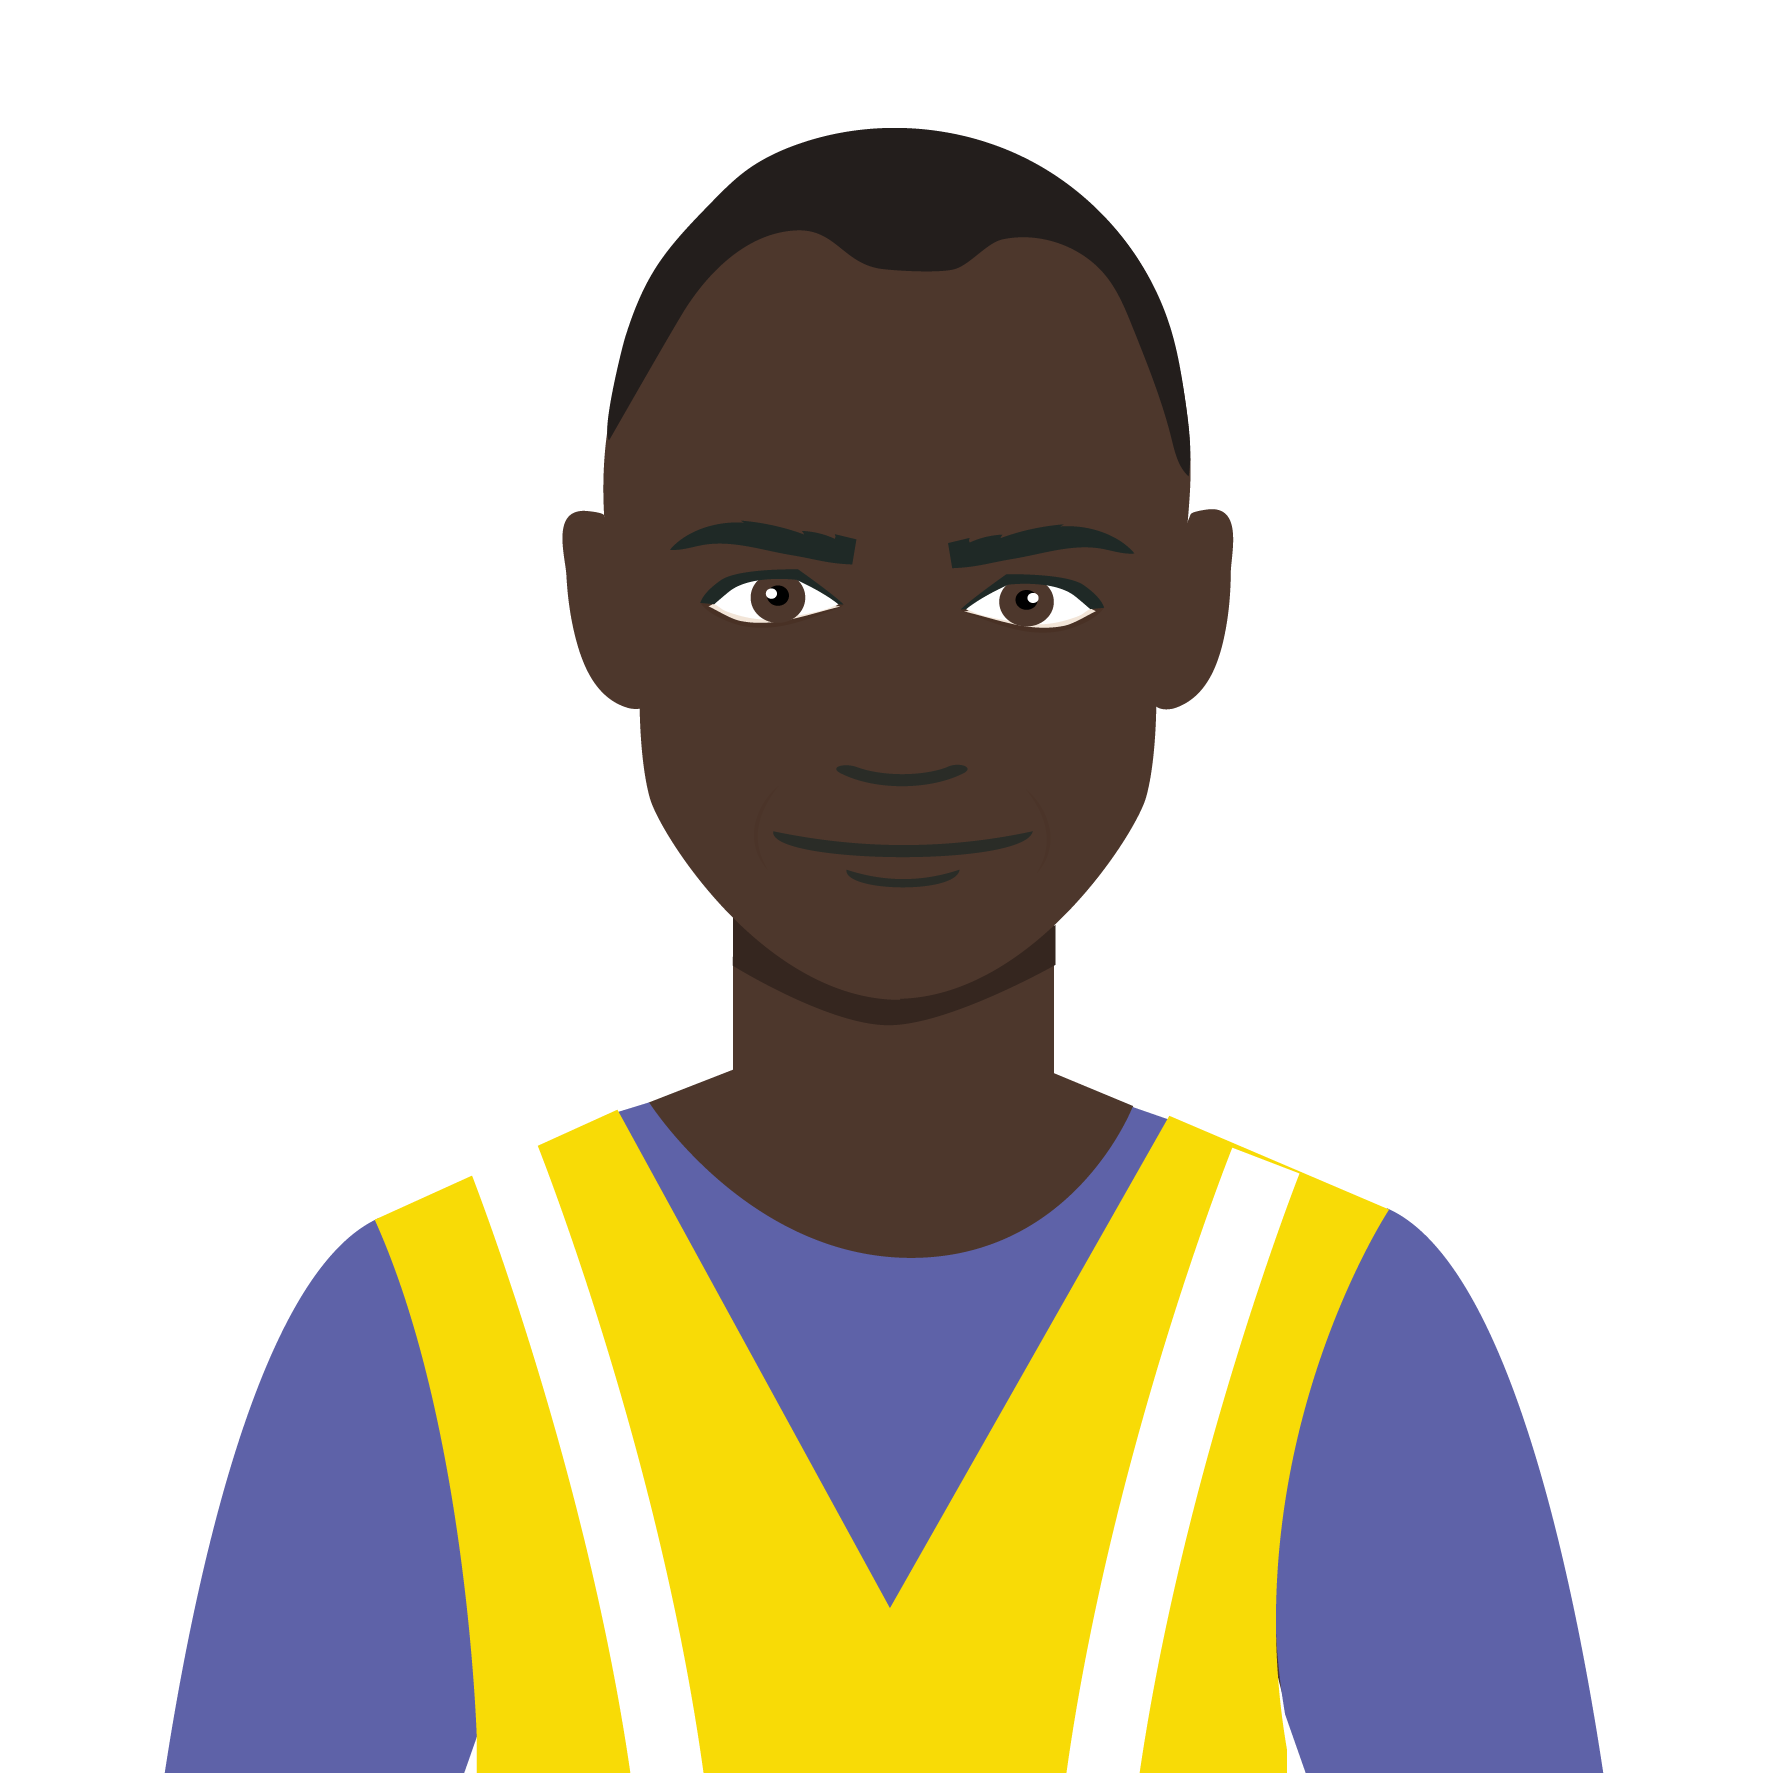 jaquier_habefast_illu_employes-1773x1773-site_Plan de travail 1 copie 2